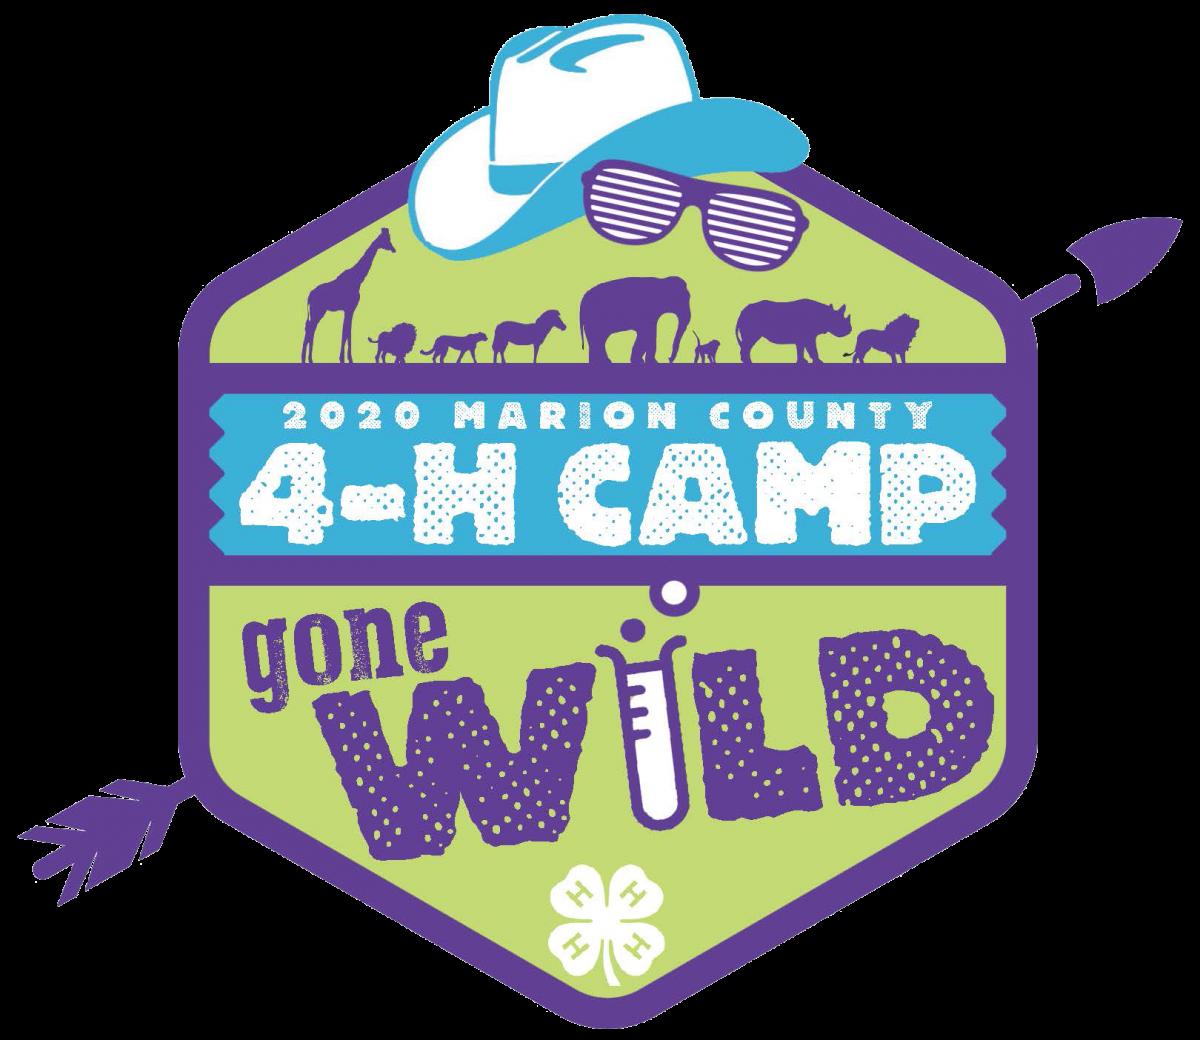 4-H camp logo 2020